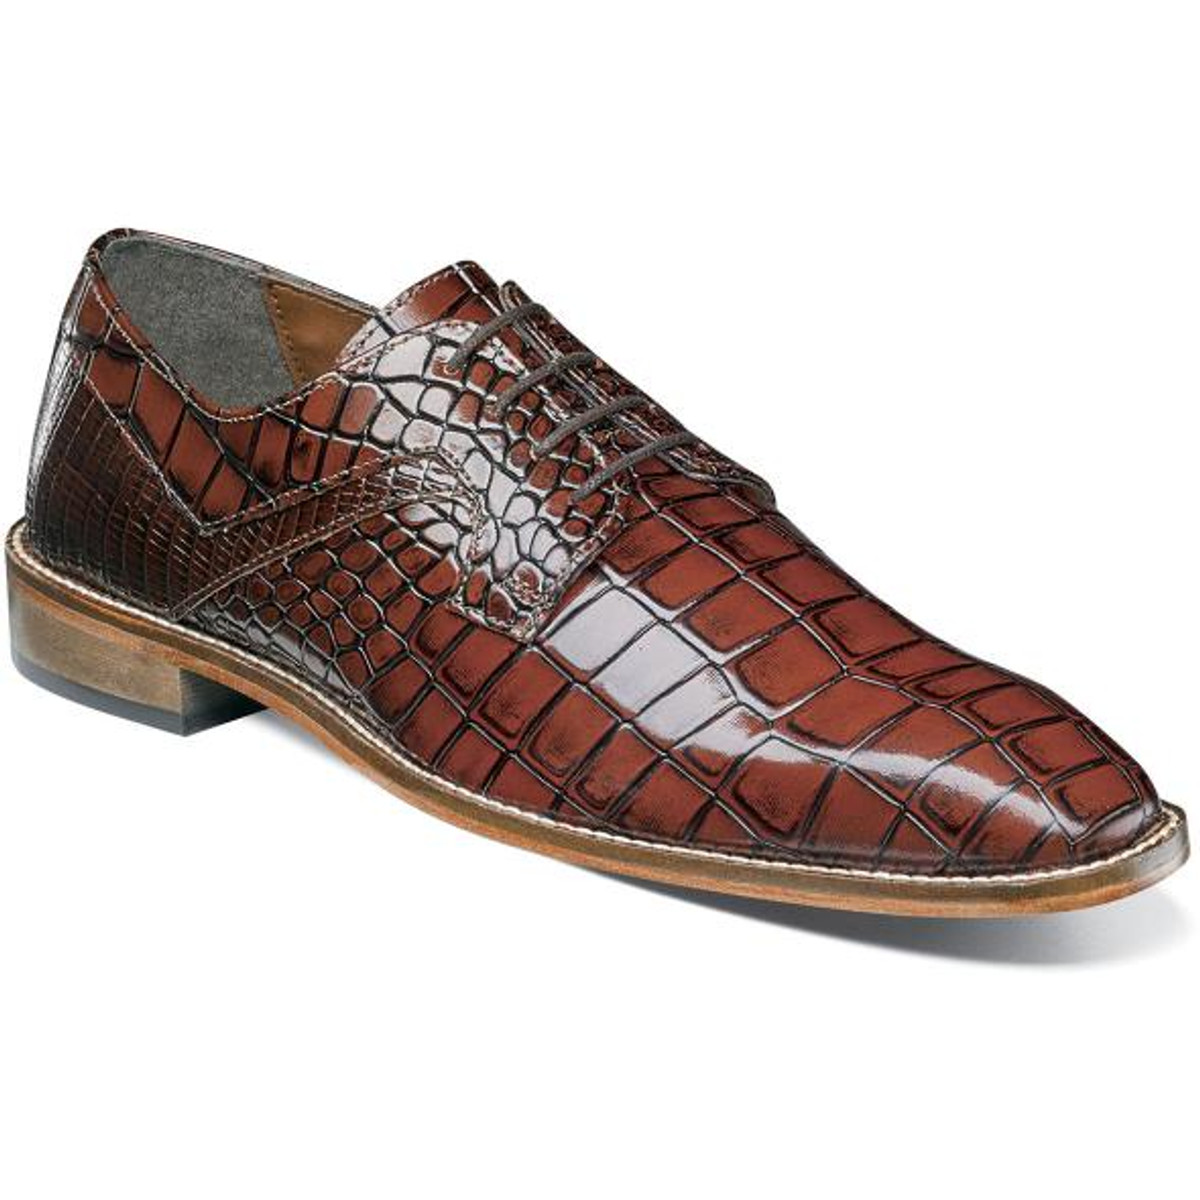 Stacy Adams Cognac Brown Alligator Texture Dress Shoes 25211-229